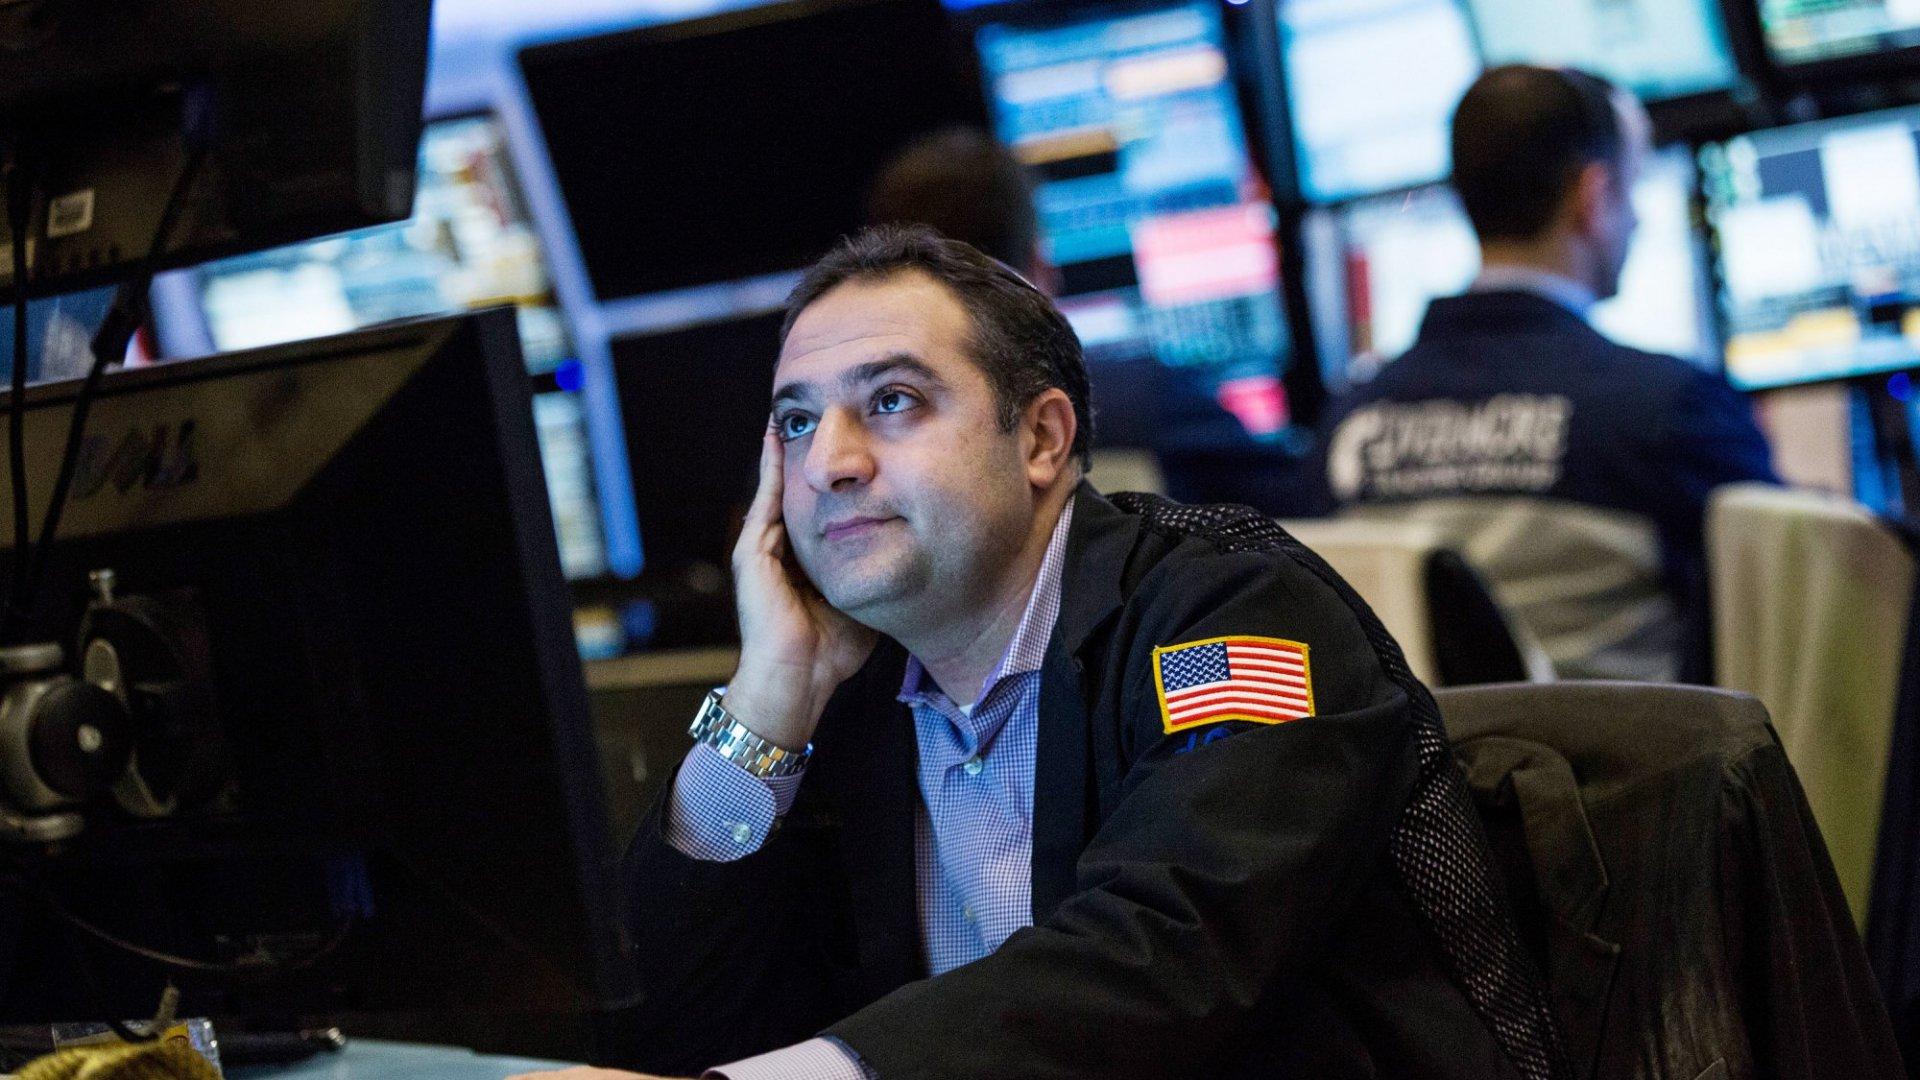 U.S. Stocks Sink on Jitters Over North Korea, China Weakness